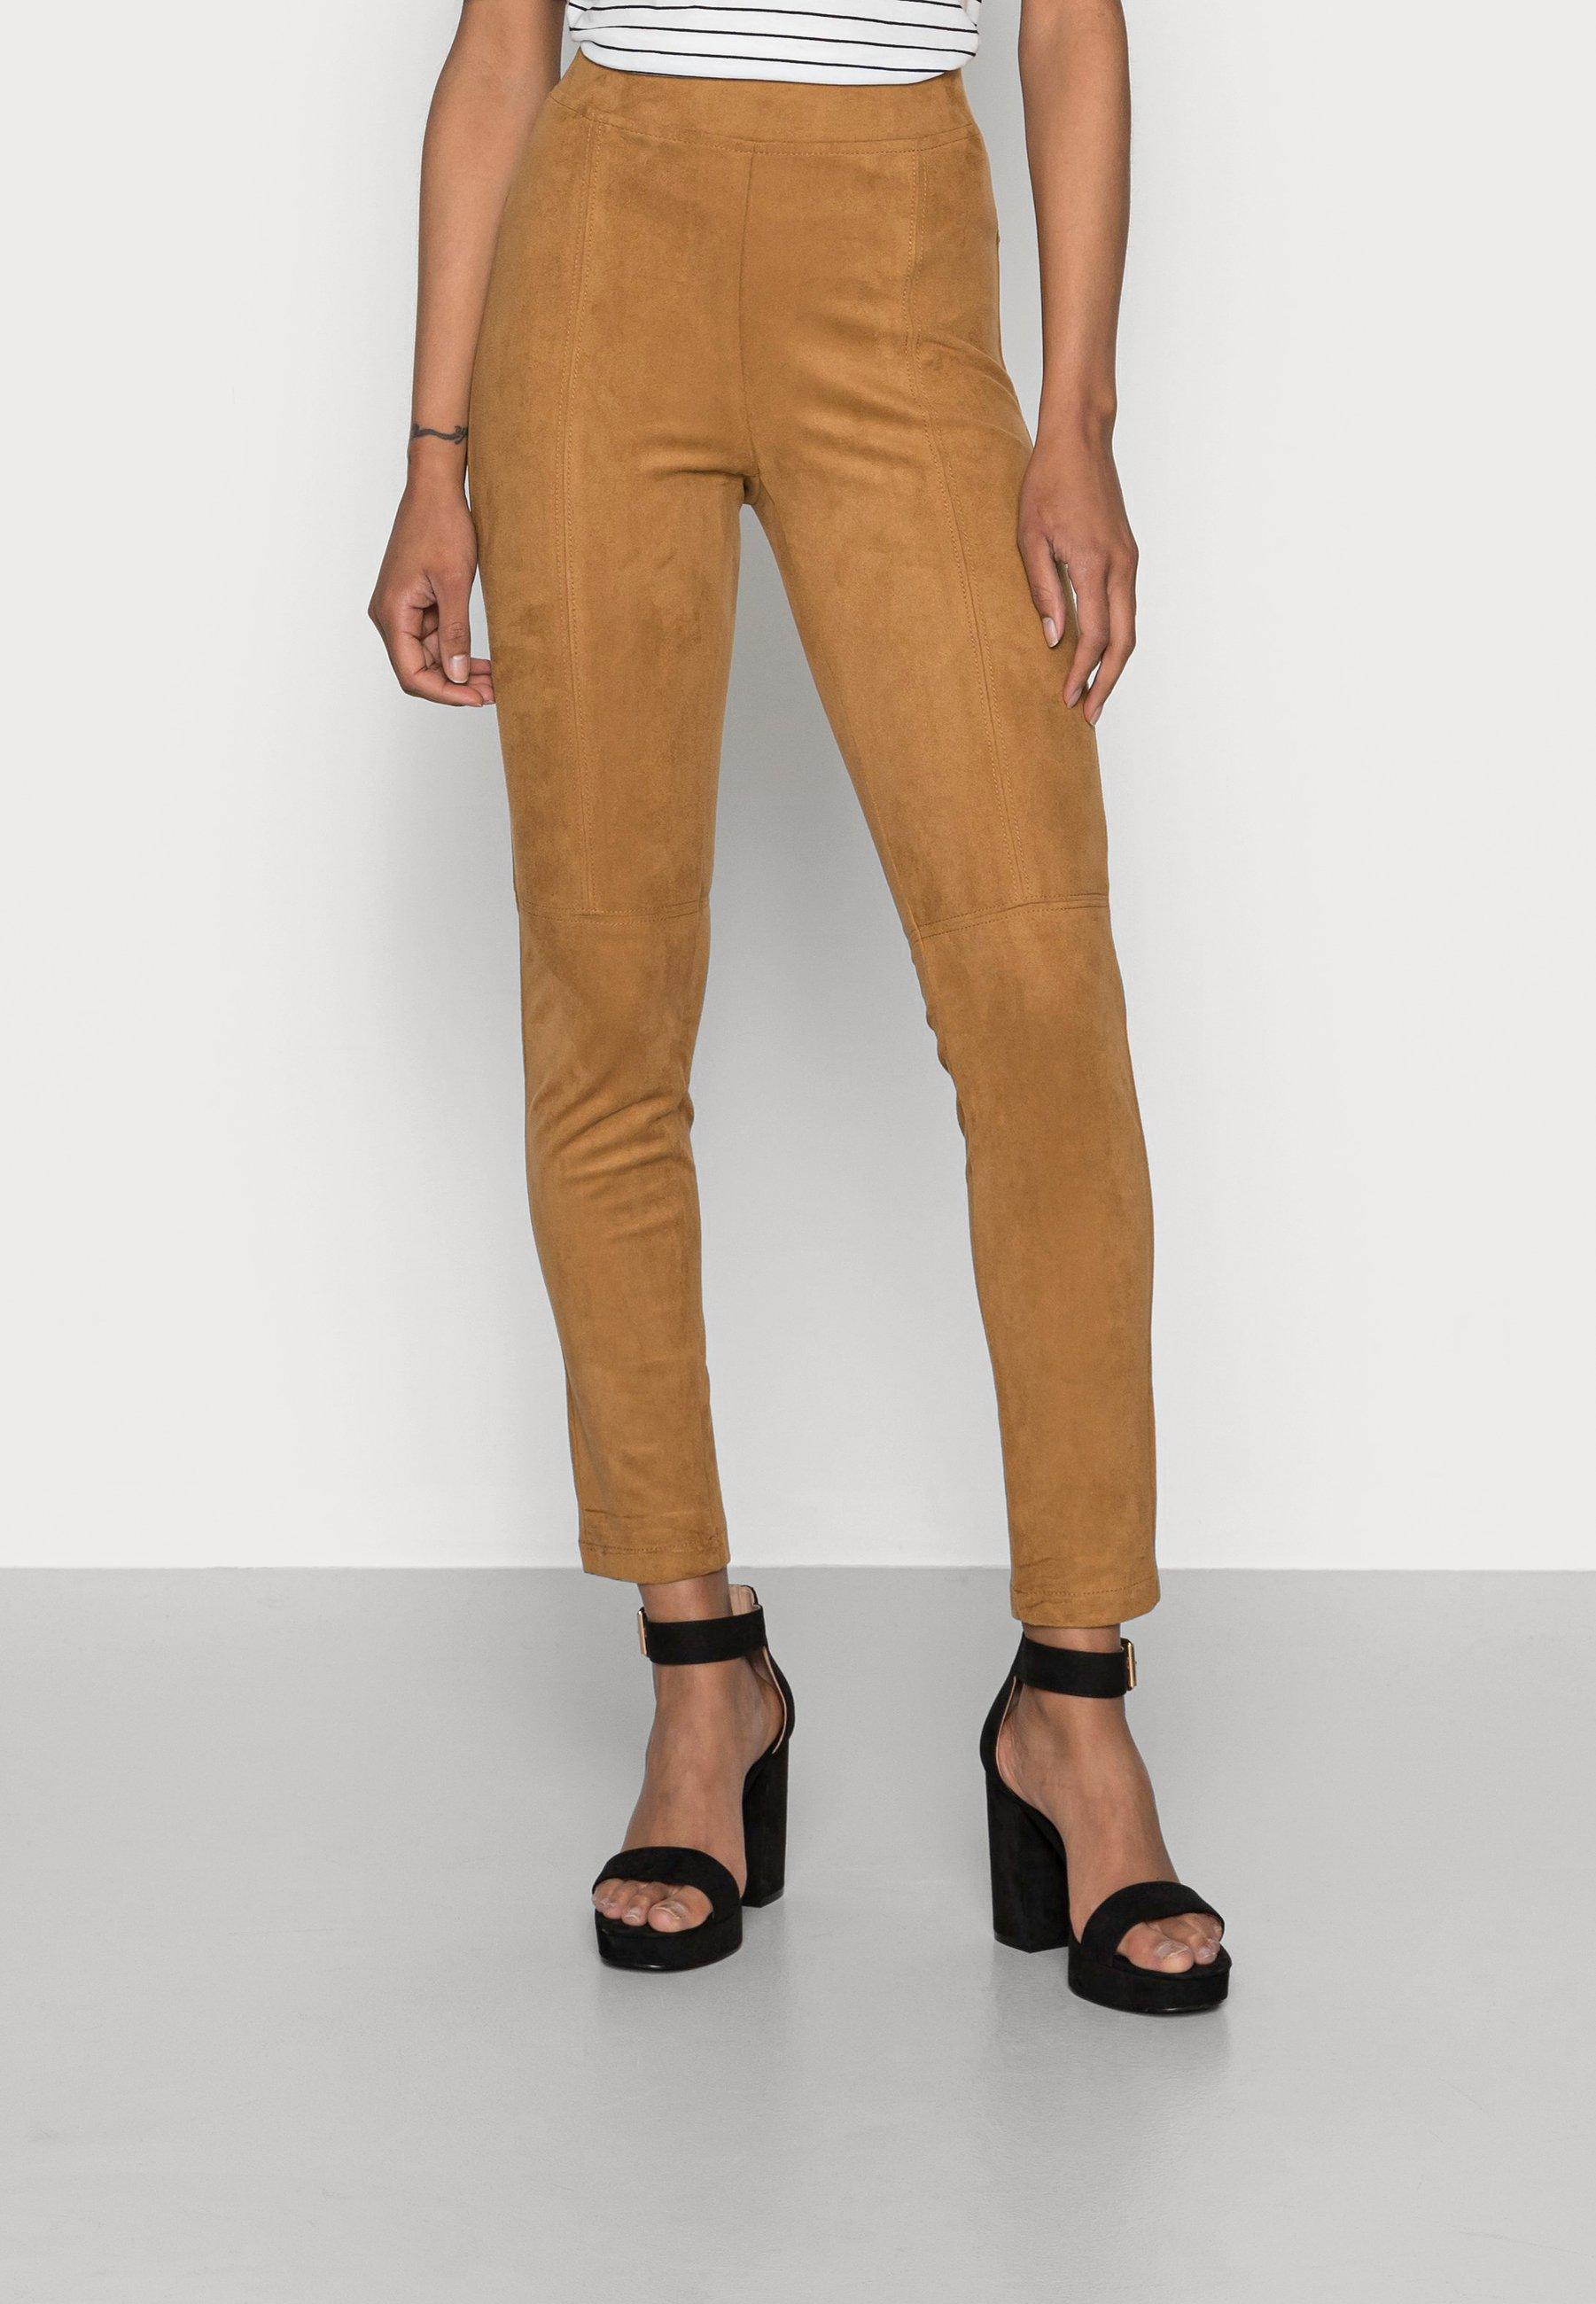 Damen SUEDE  - Leggings - Hosen